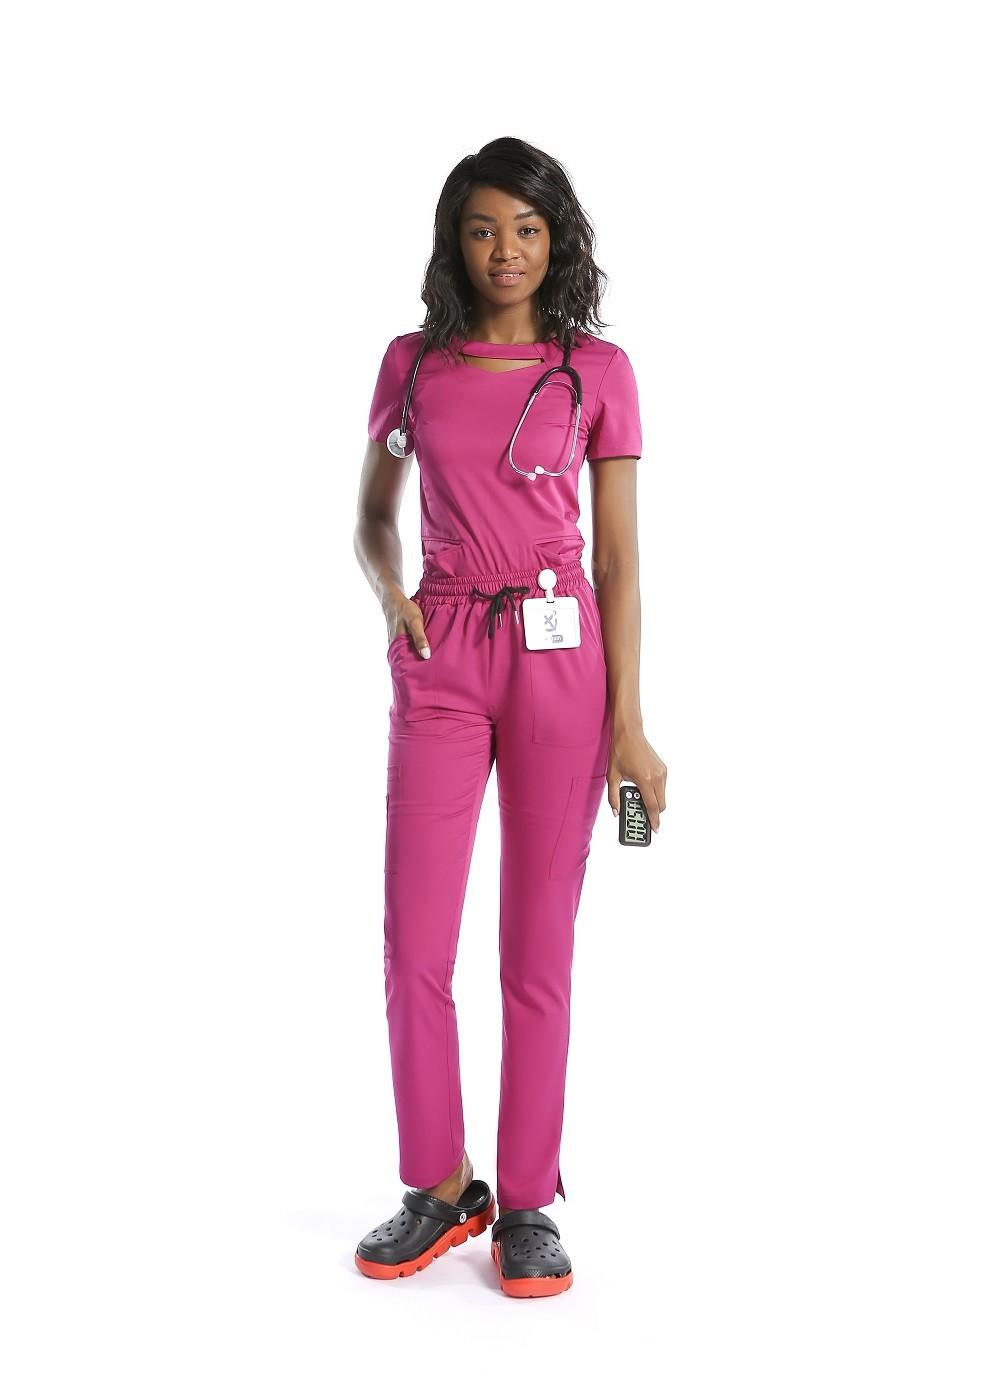 scrubs uniforms bakersfield